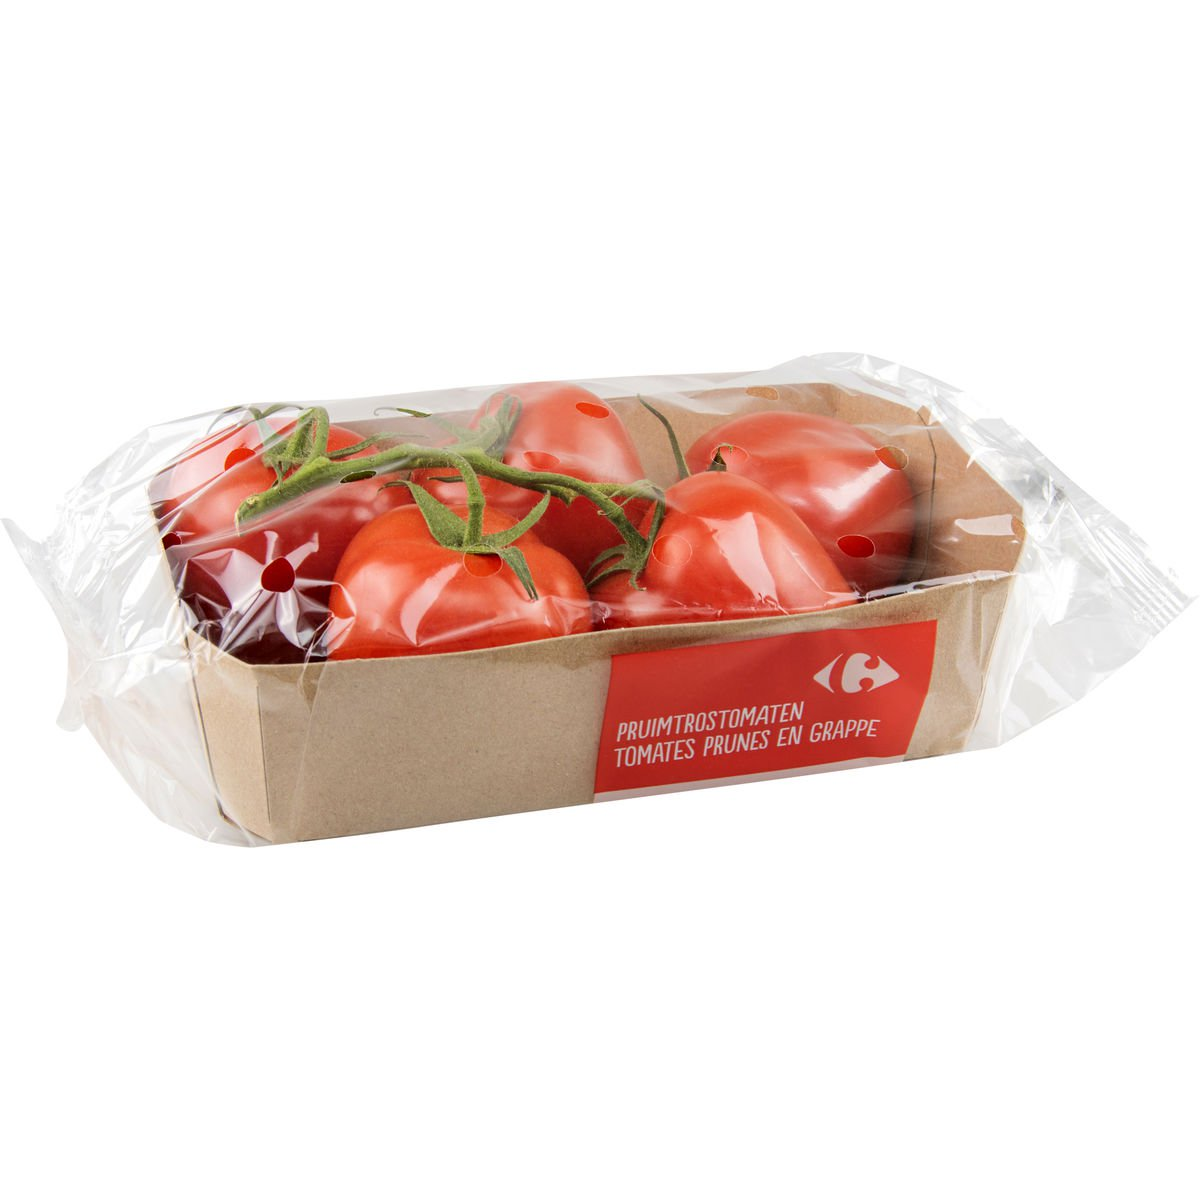 Carrefour Pruimtrostomaten 550g